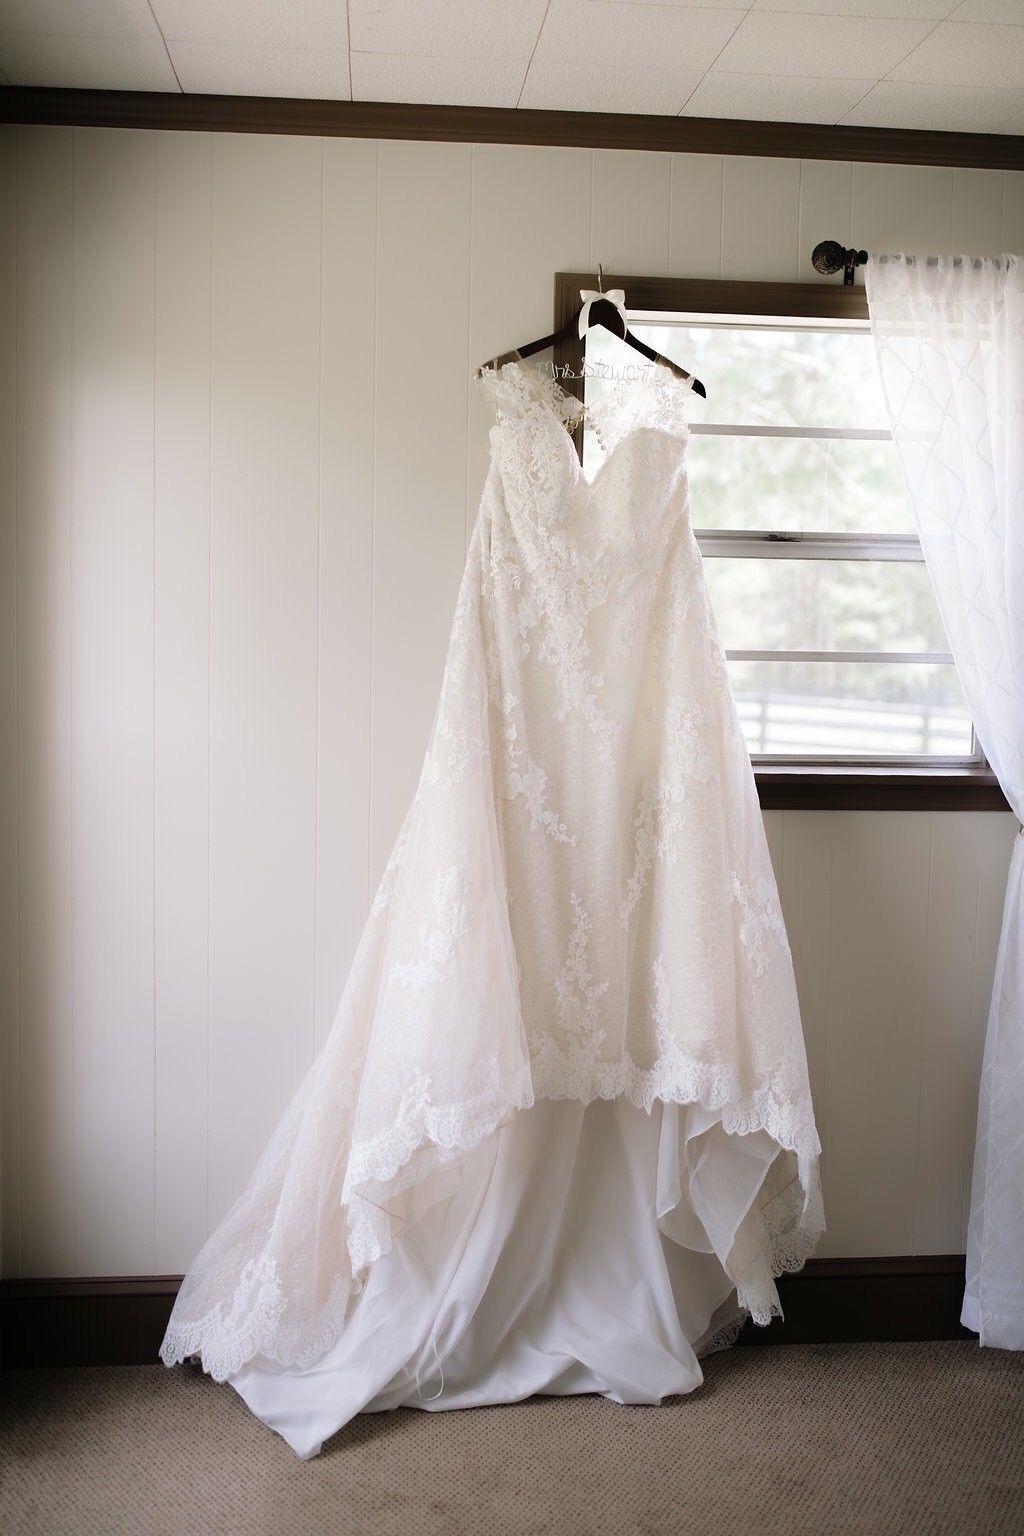 pronovias Primadona wedding dress size 24, worn once | Pinterest ...